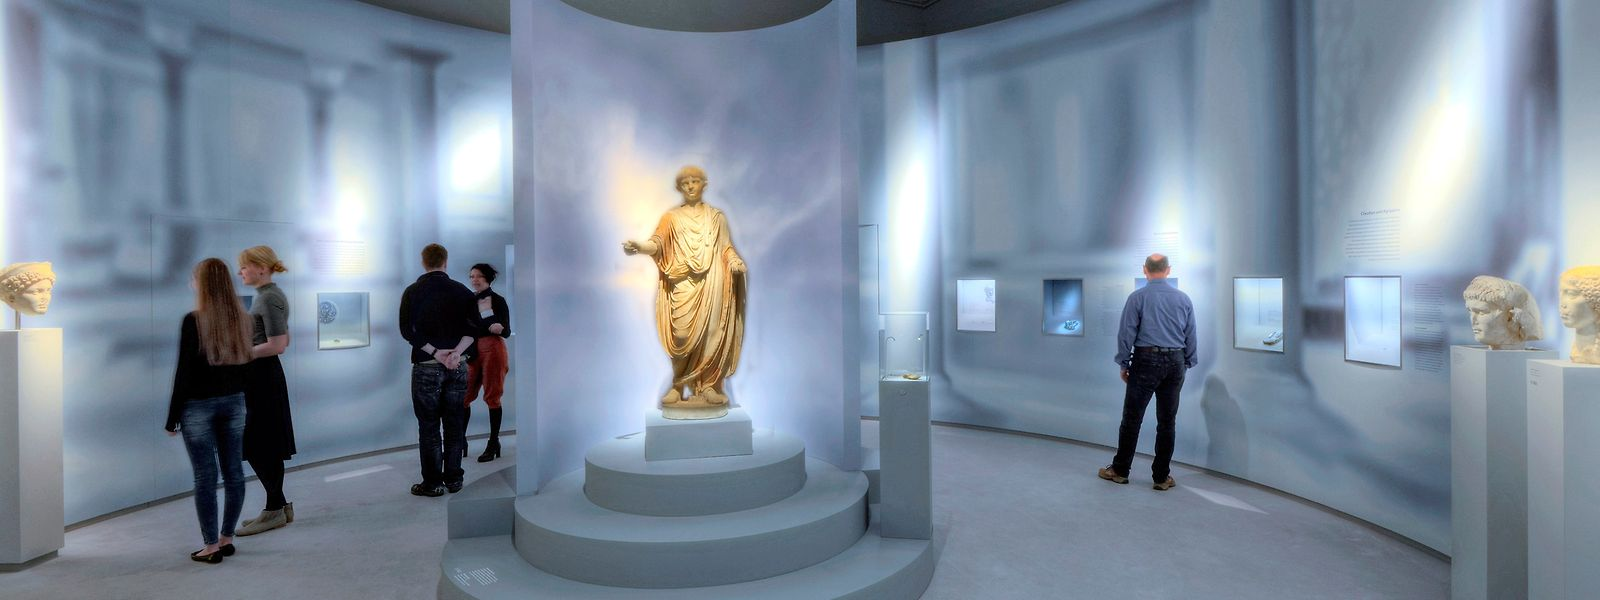 Nero: Antiker Popstar